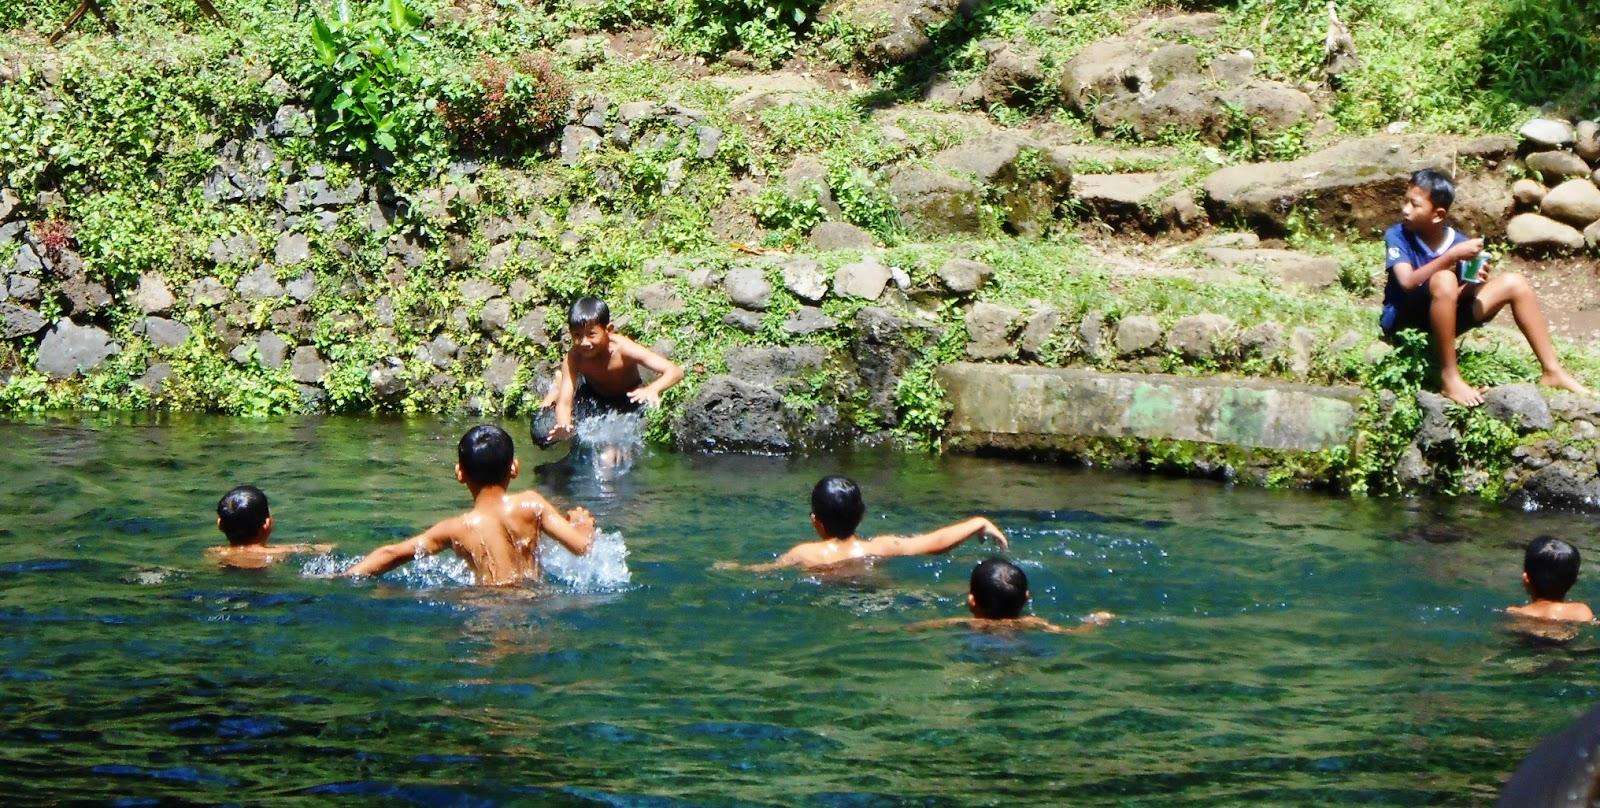 Limakaki 15 Destinasi Wisata Purbalingga Mempesona Pojok Kayangan Kab